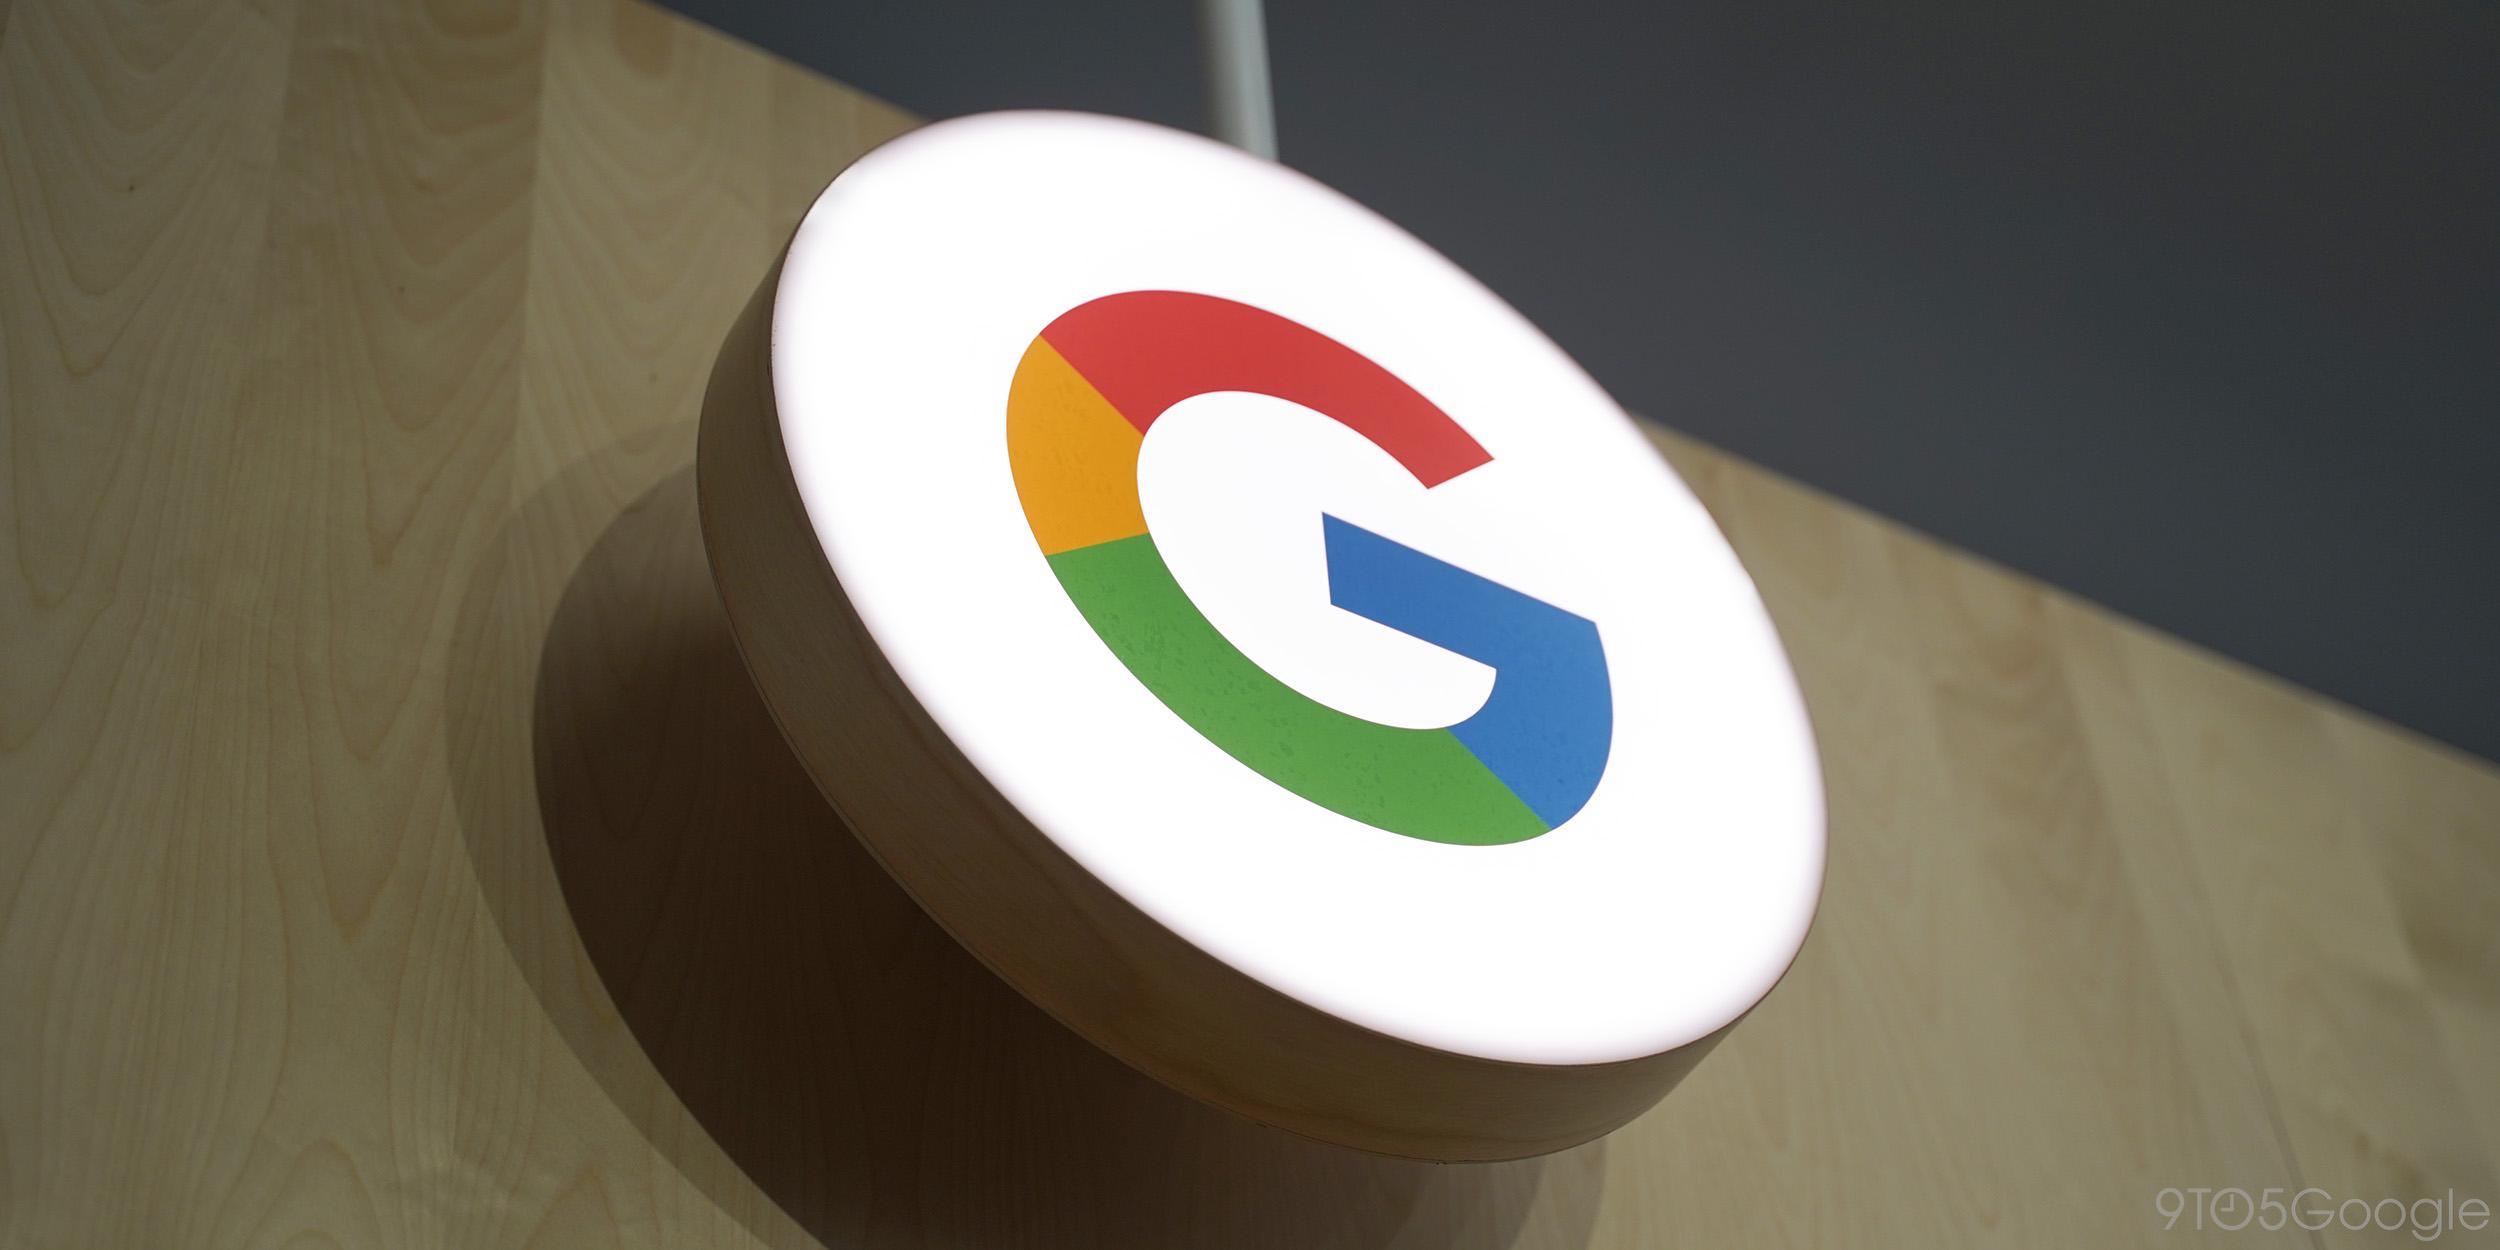 google_logo_1.jpg?resize=2000%2C0&quality=82&strip=all&ssl=1